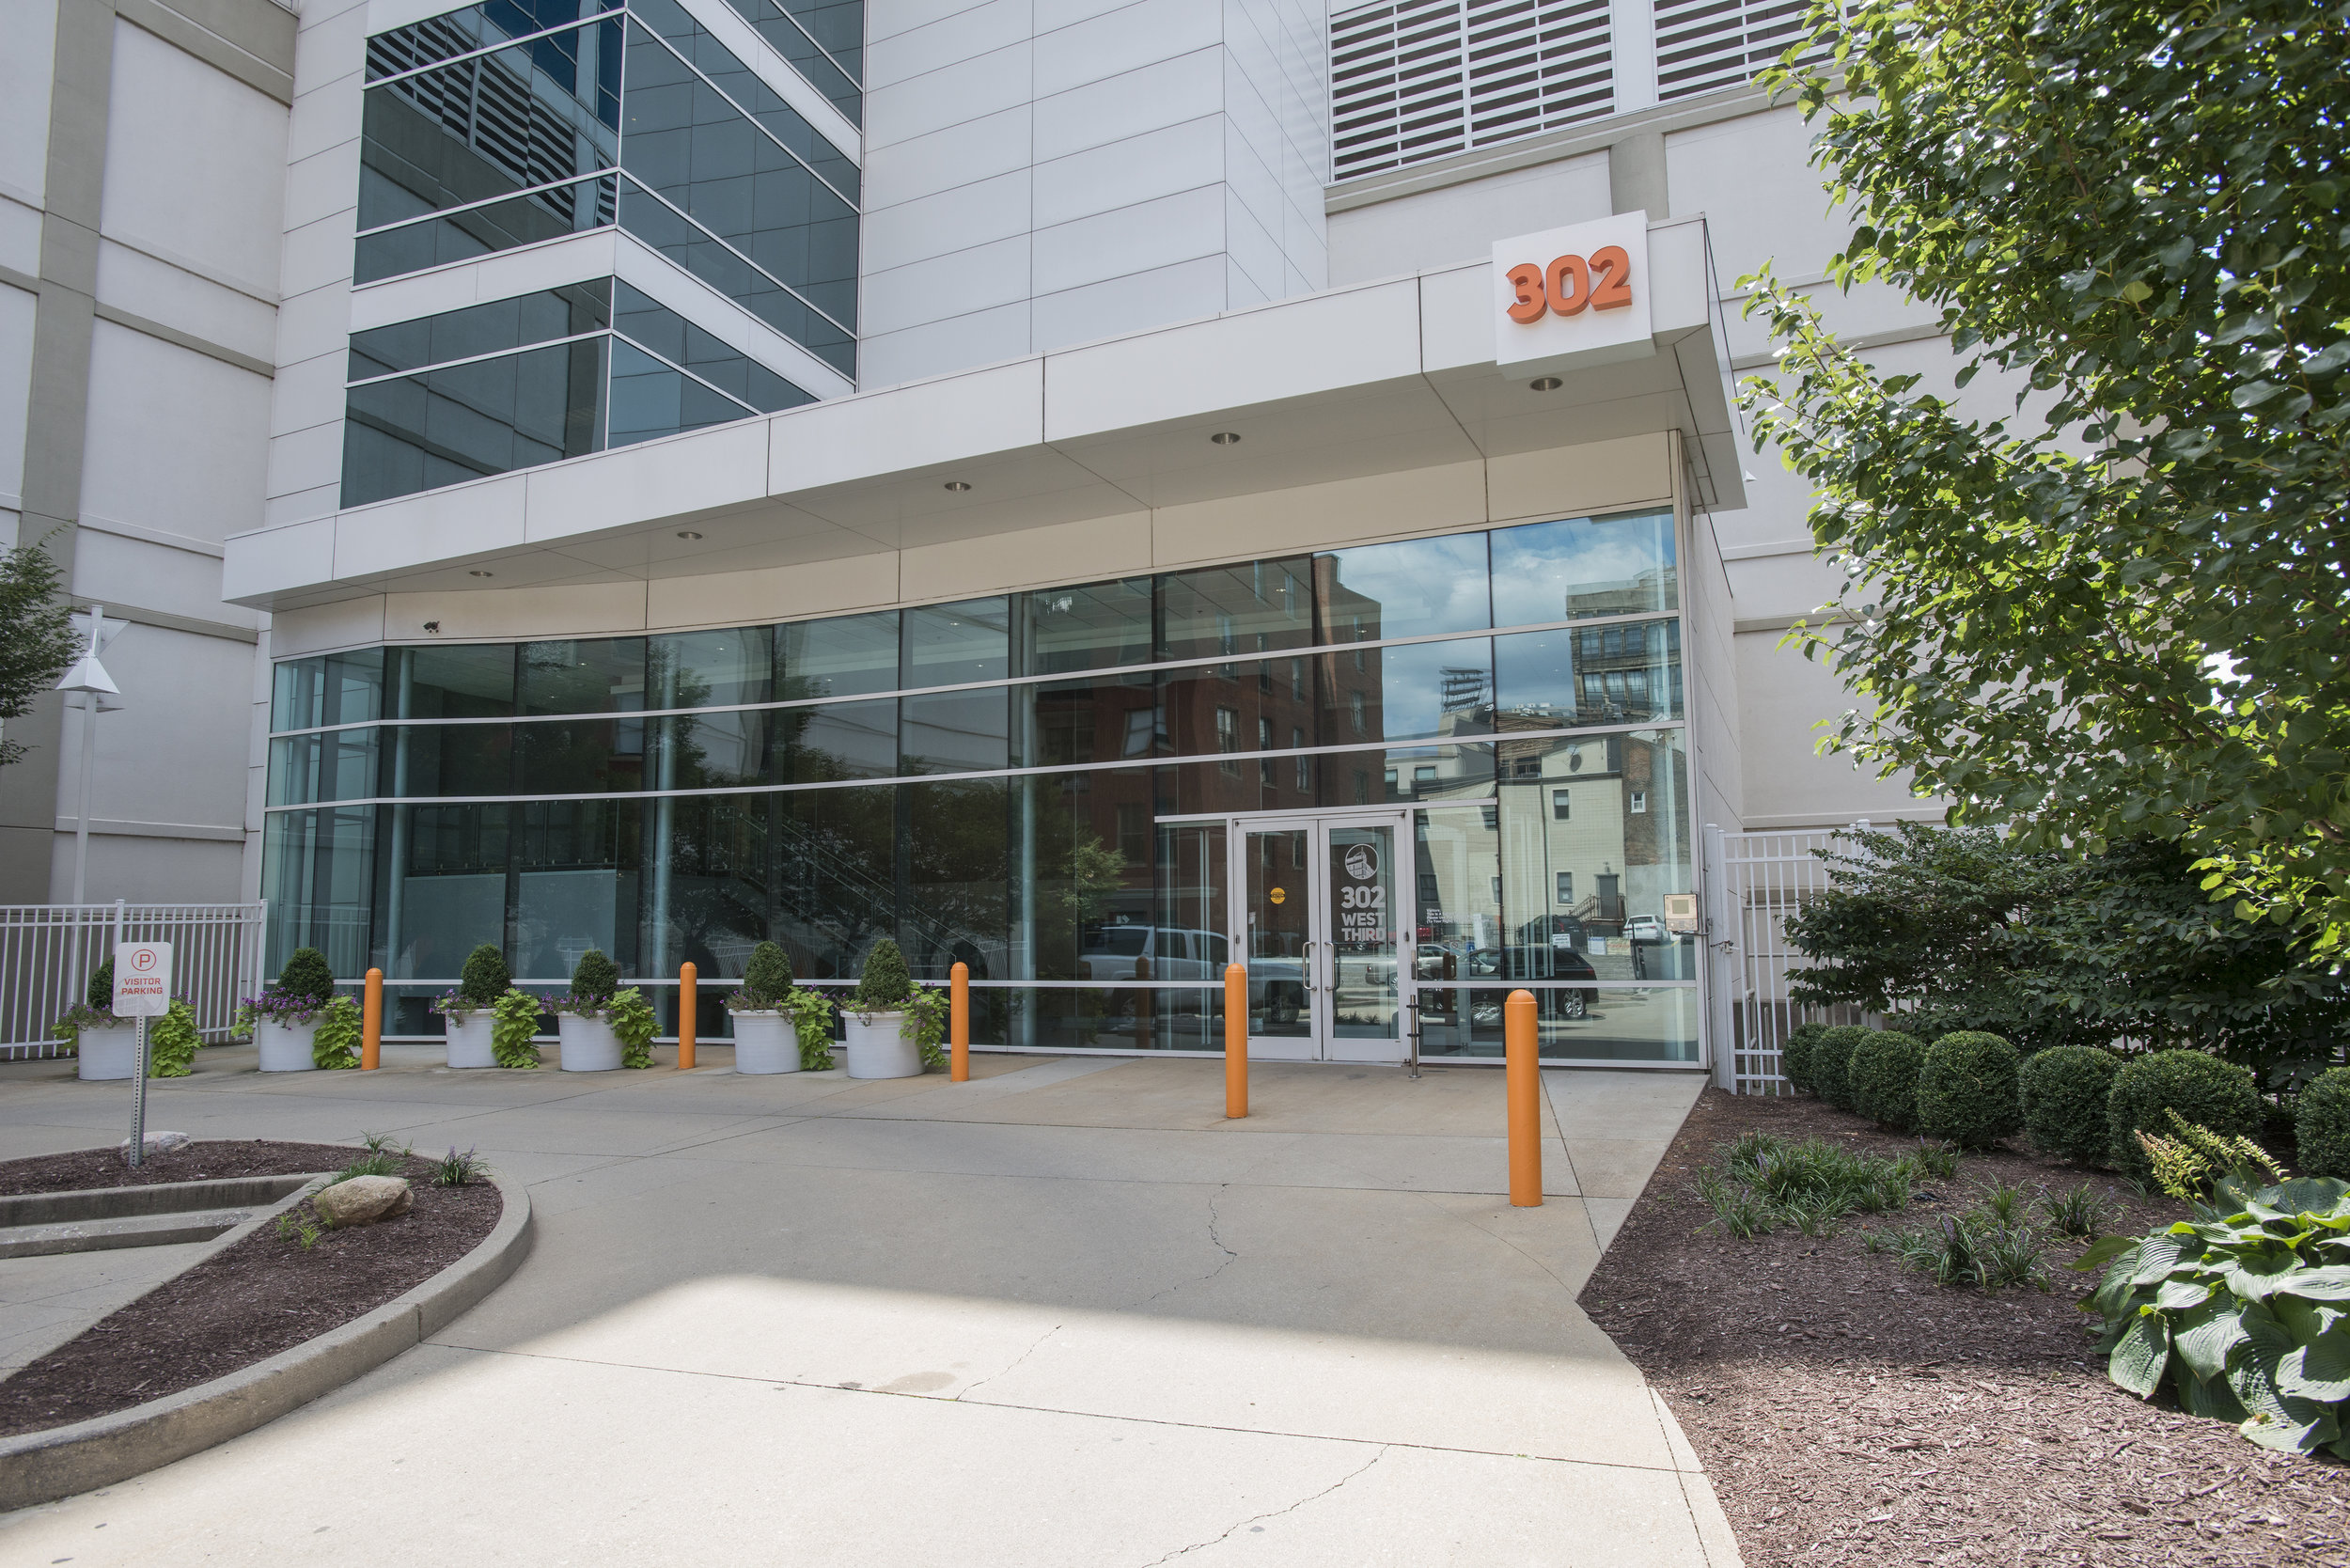 McFarland (Visitor) Entrance